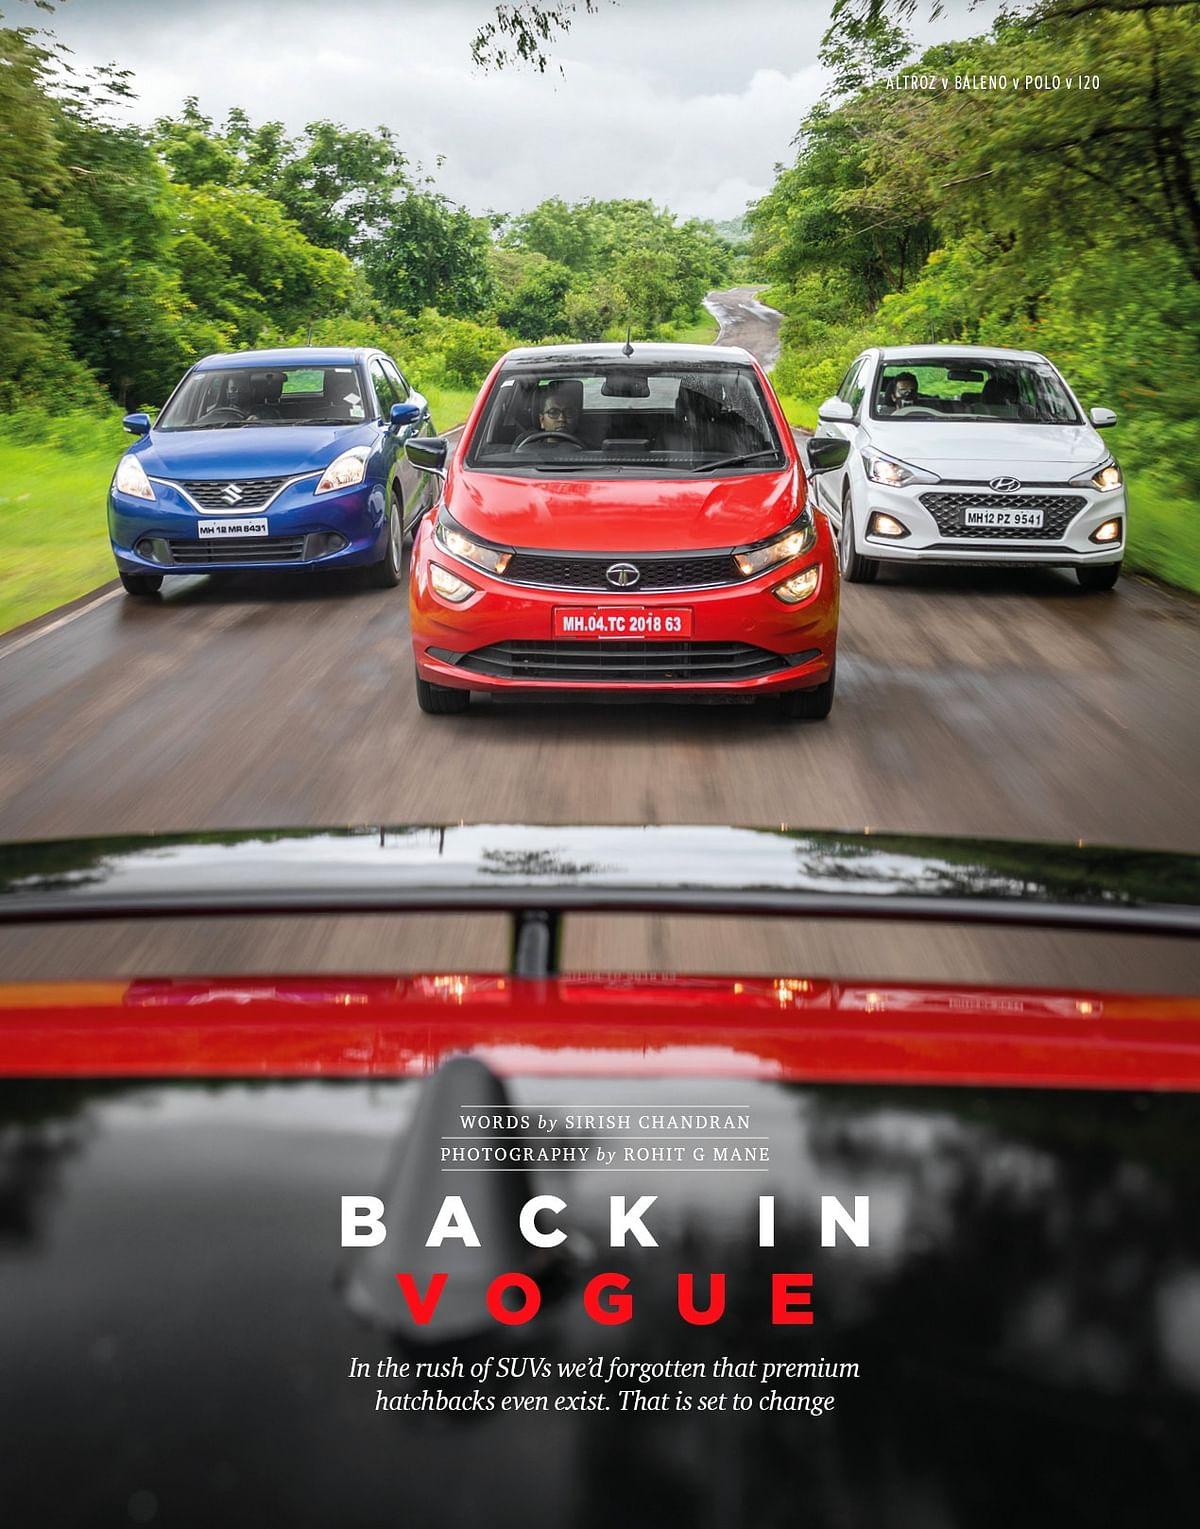 Tata Altroz pitted against the VW Polo, Maruti Suzuki Baleno and Hyundai i20